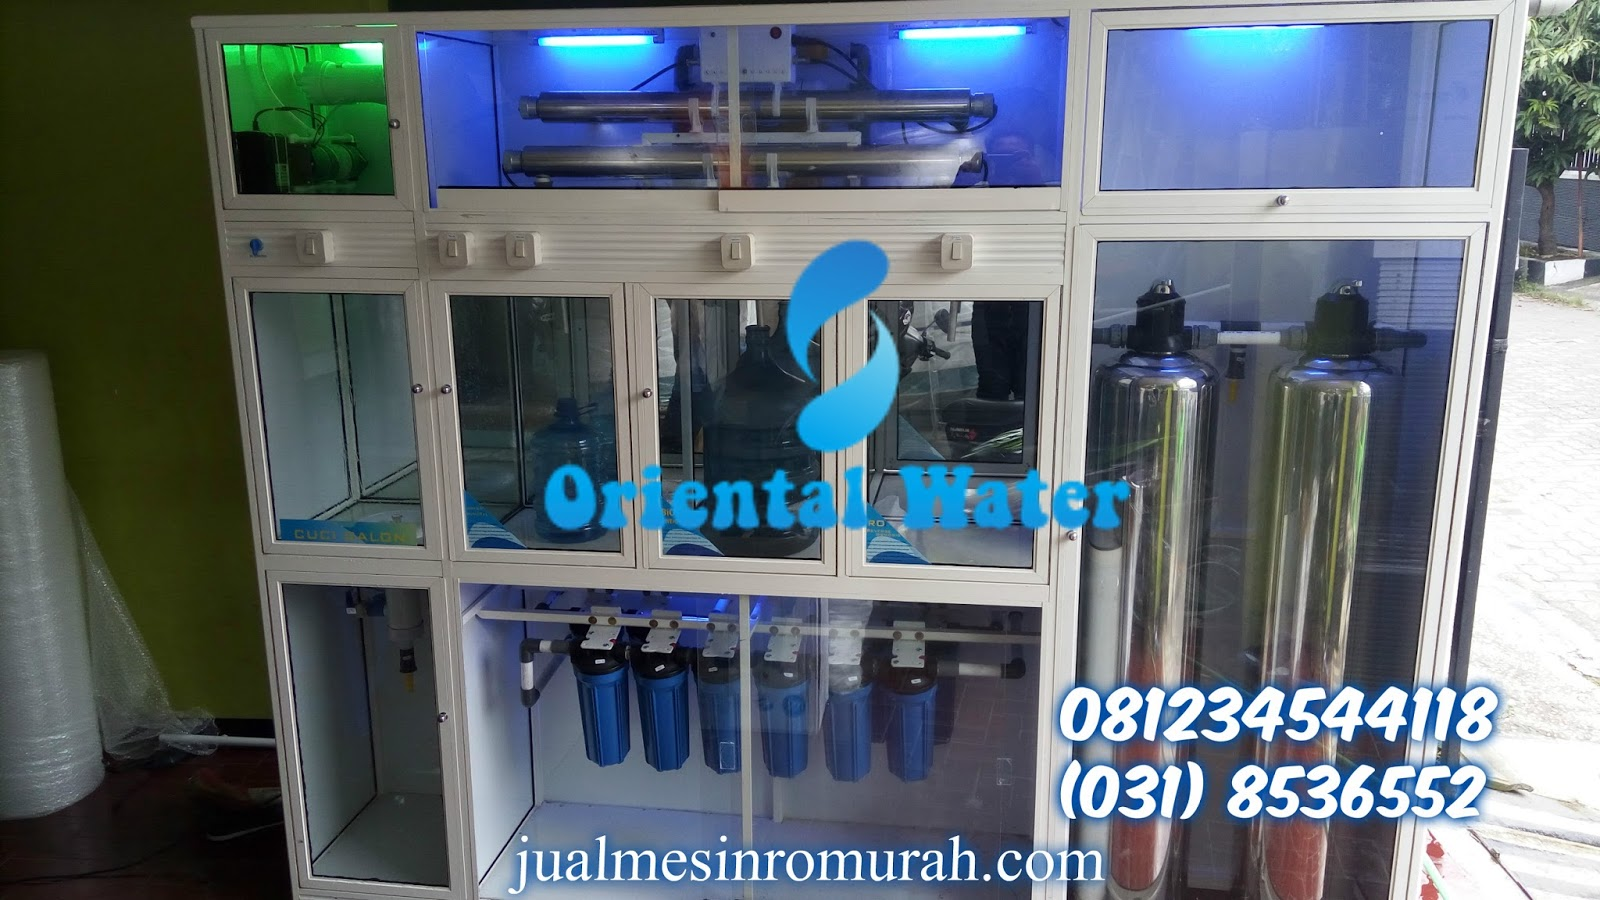 Depo Air Minum Isi Ulang Mesin Reverse Osmosis Tissue Galon Paket Ro Alkalin 02 Rp 26000000